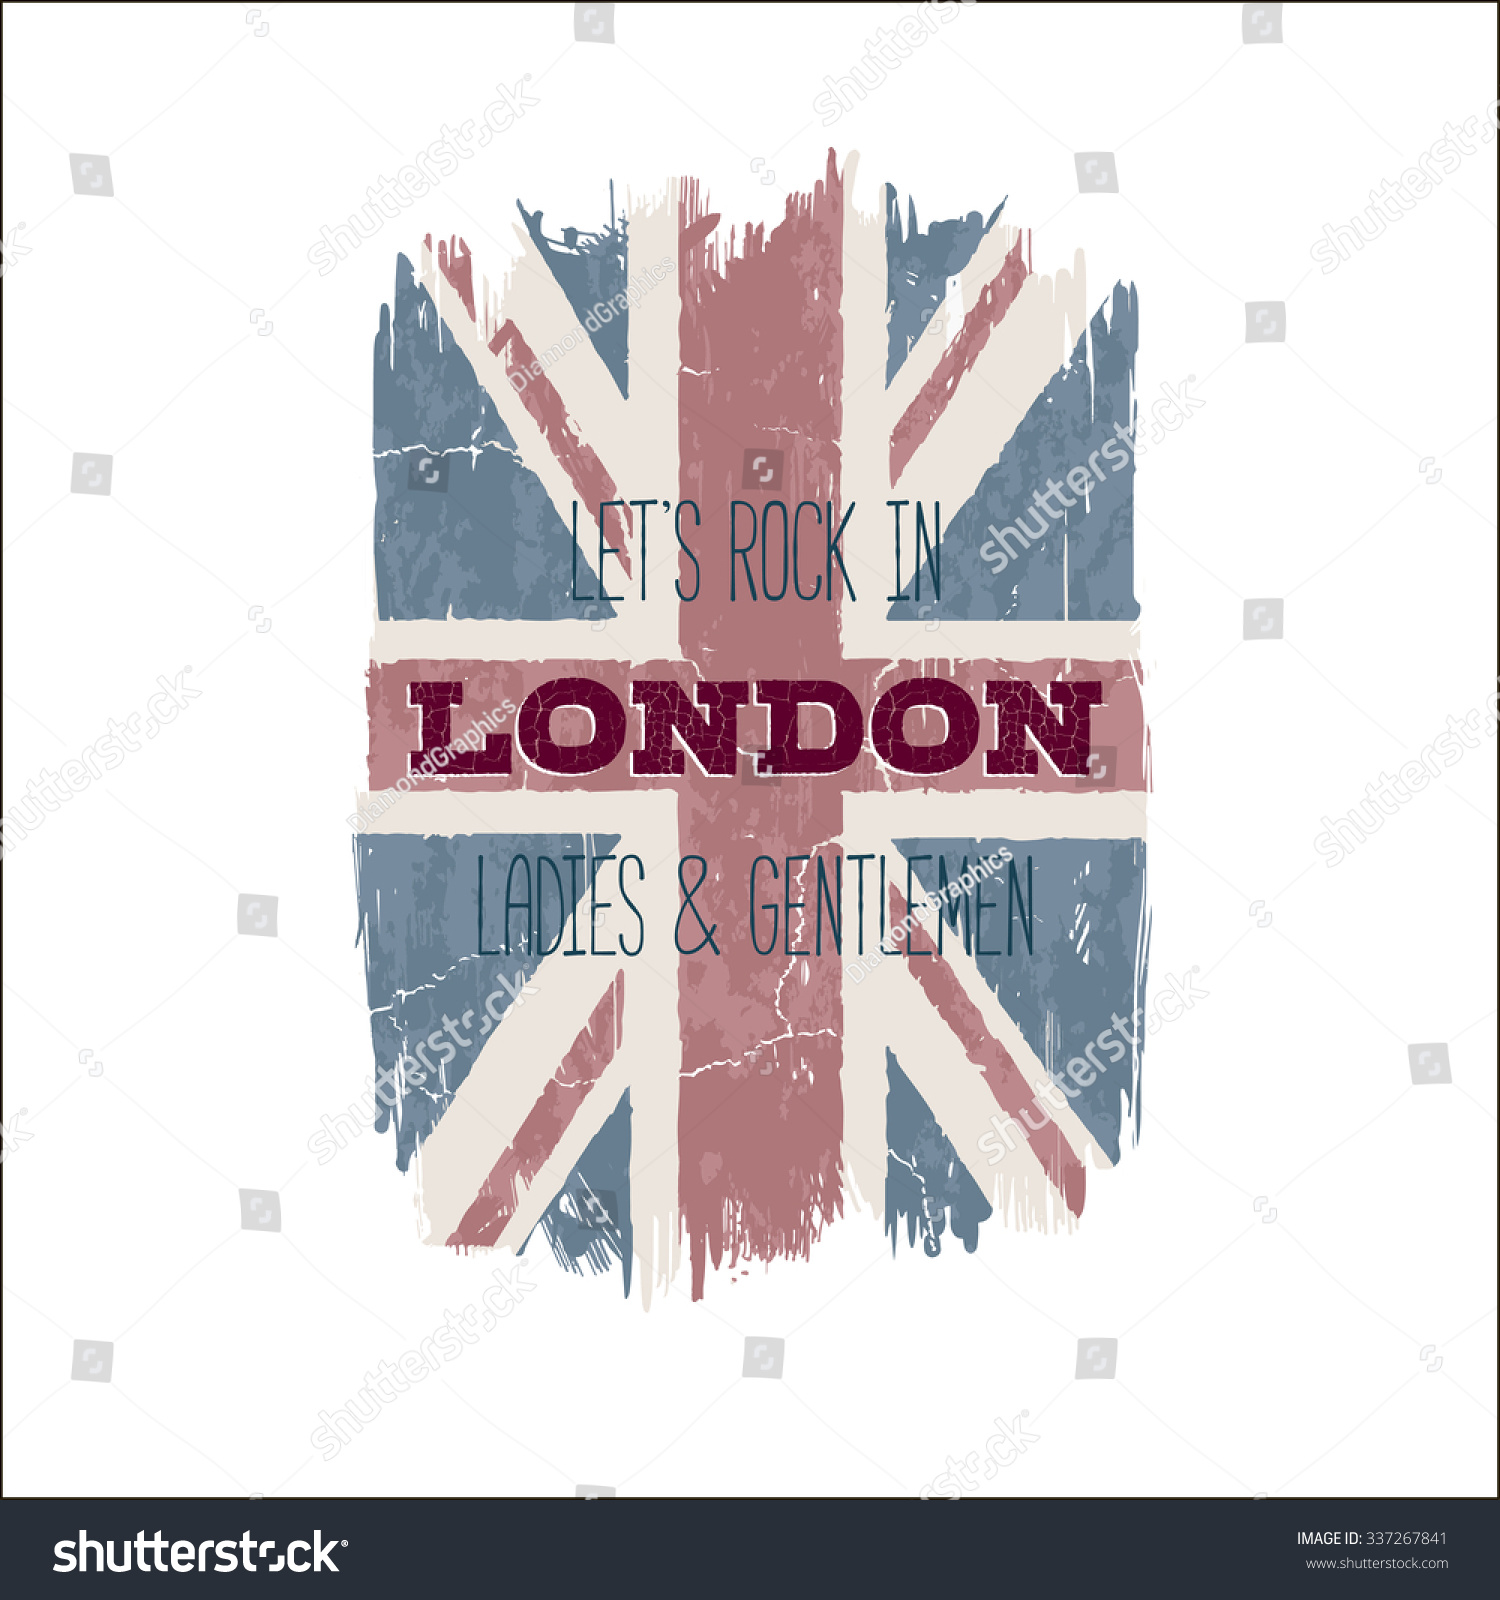 Shirt design london - Save To A Lightbox